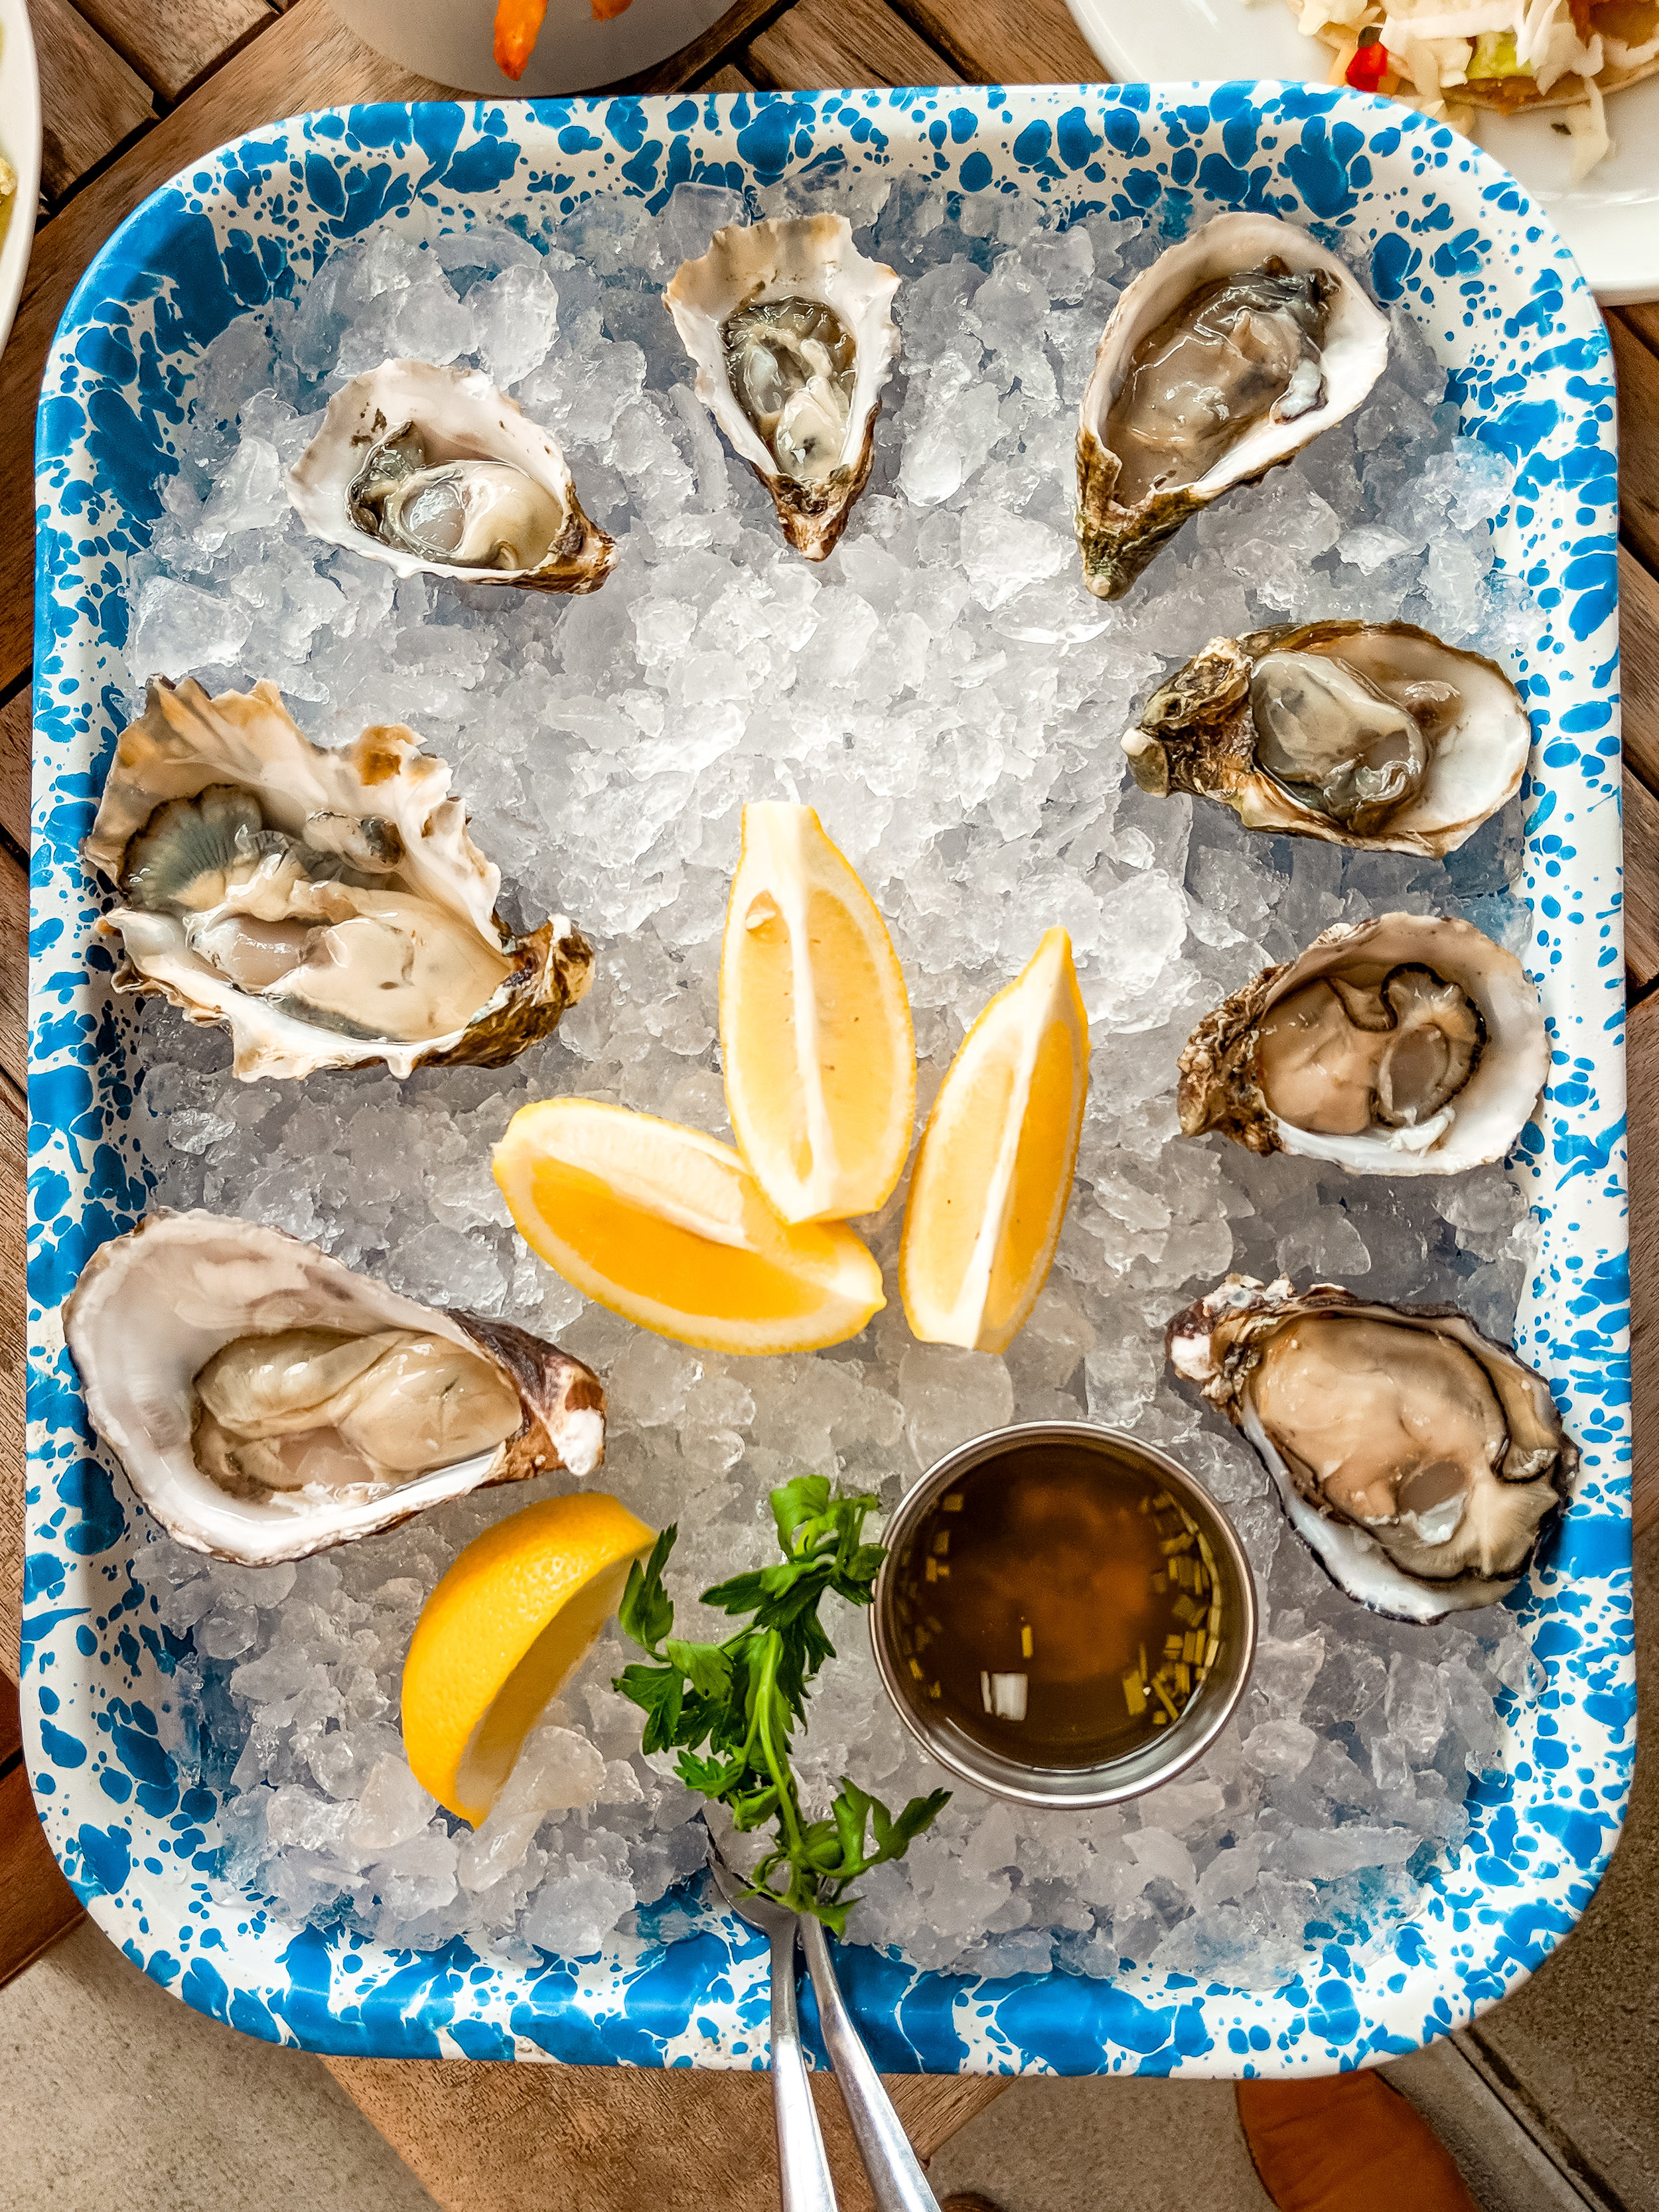 Ways & Means Oyster Spread Style by Julianne